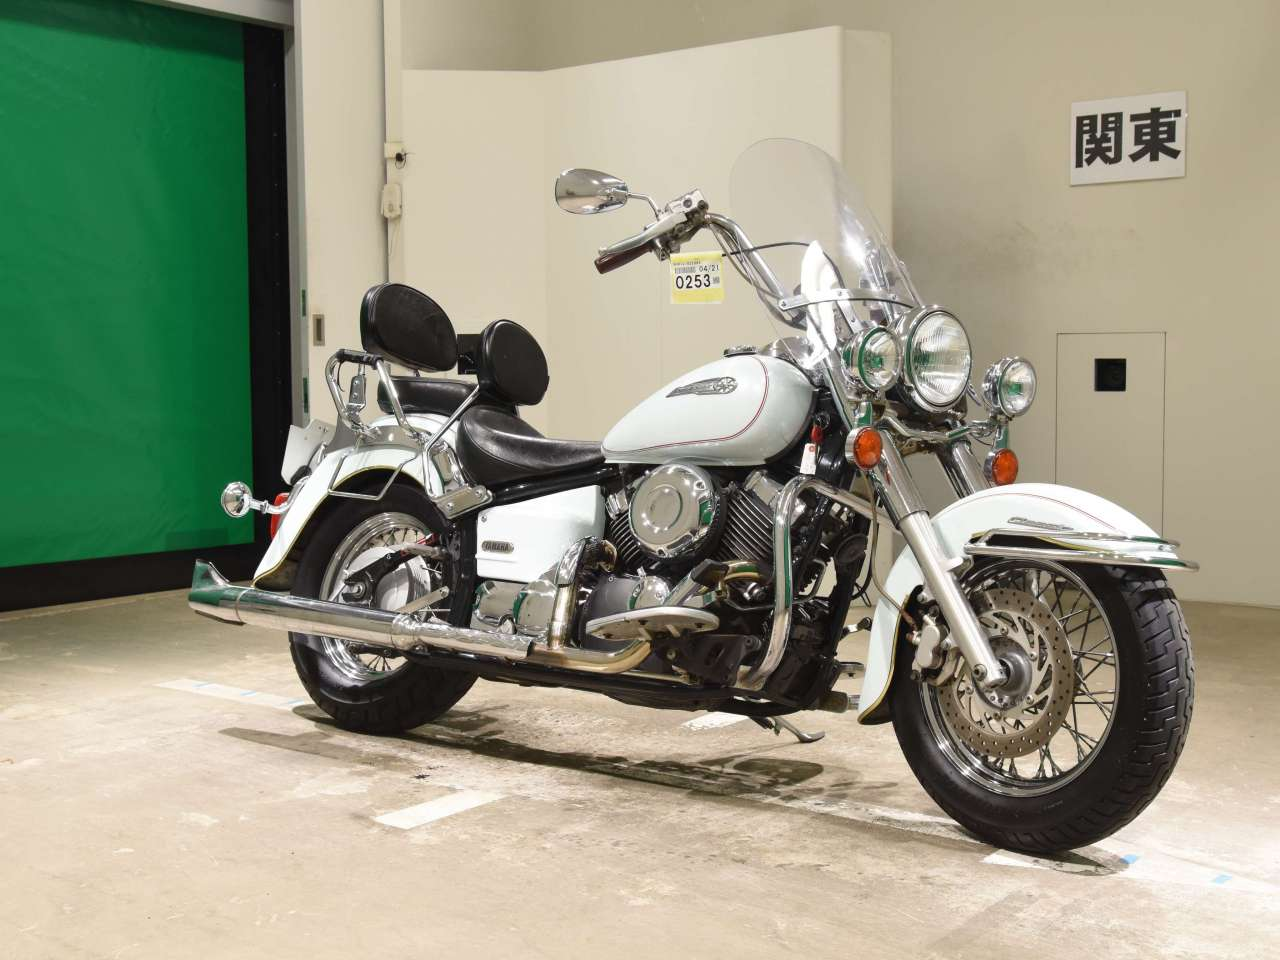 МОТОЦИКЛ YAMAHA DRAG STAR 400 Classic 2007  Артмото - купить квадроцикл в украине и харькове, мотоцикл, снегоход, скутер, мопед, электромобиль